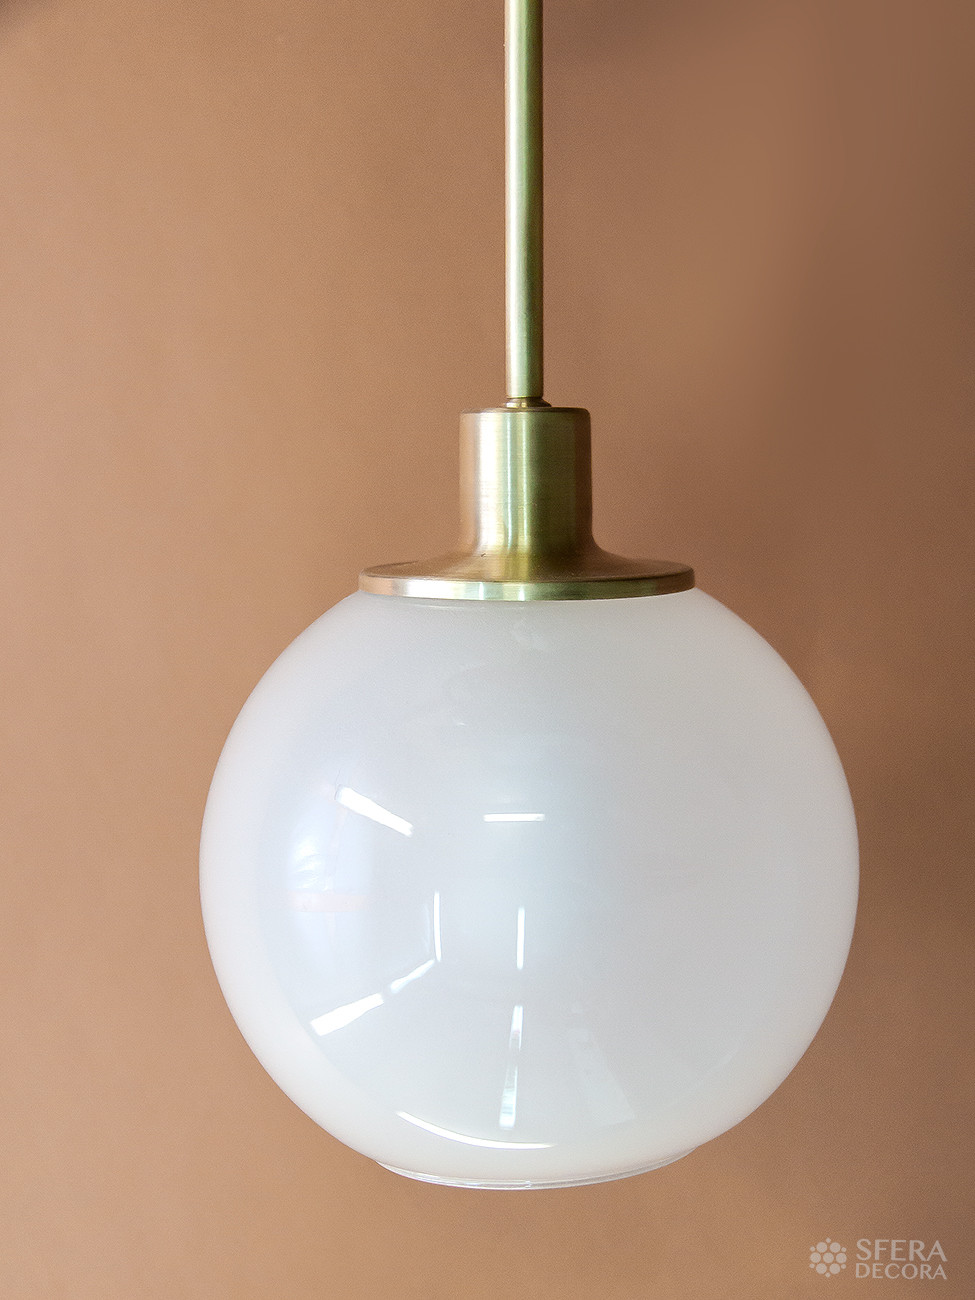 Светильник лофт из латуни и стекла